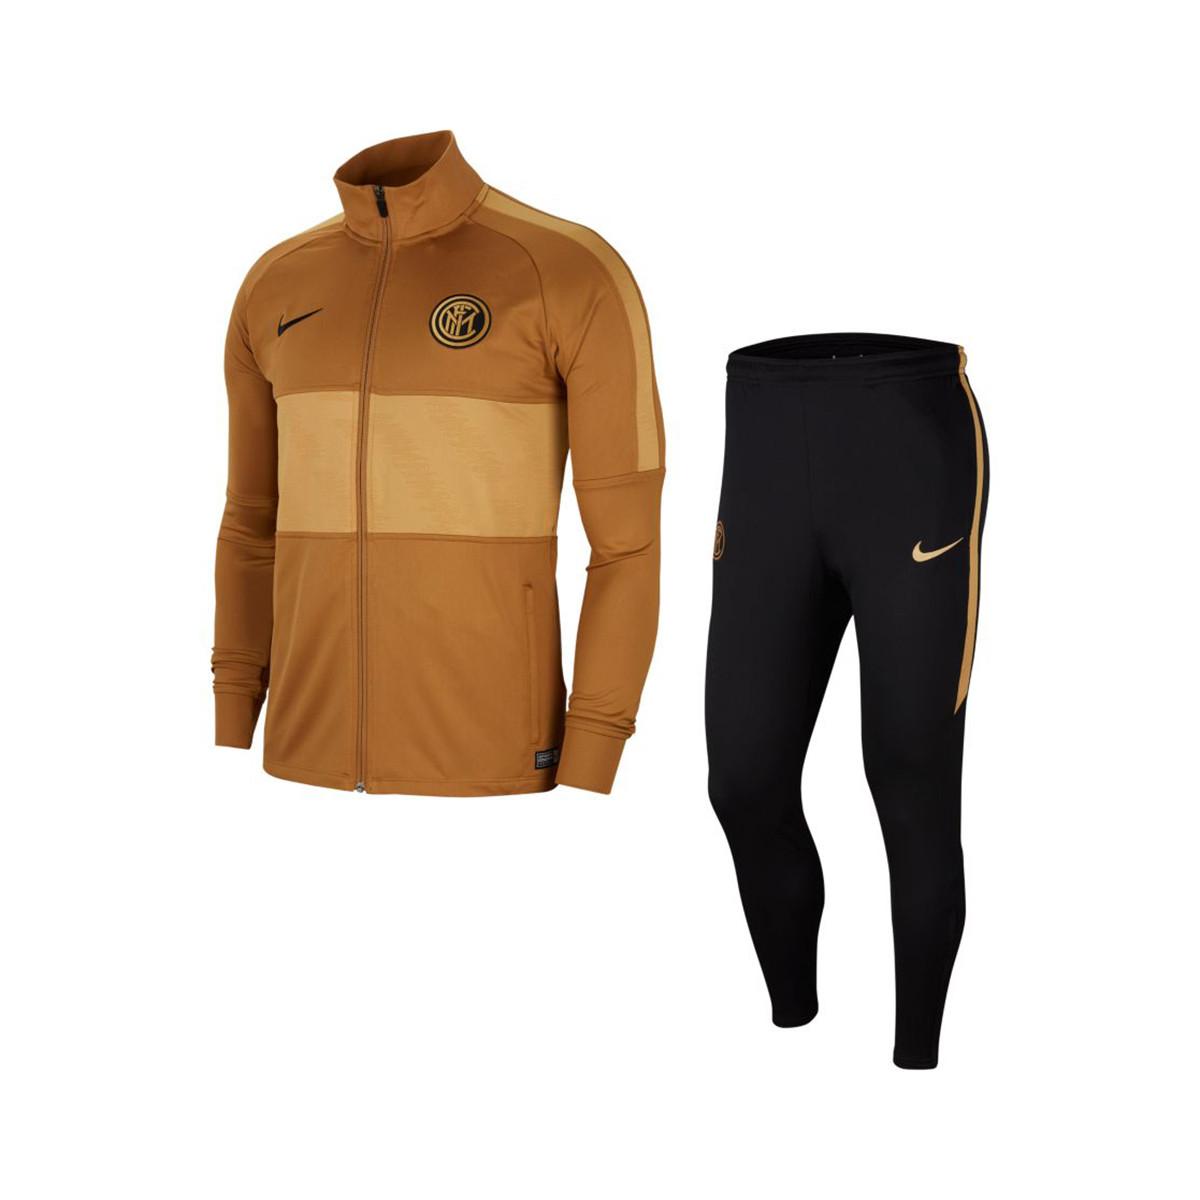 mueble Fusión mañana  Tracksuit Nike Inter de Milão Dry Strike 2019-2020 Muted bronze-Black-Truly  gold - Football store Fútbol Emotion